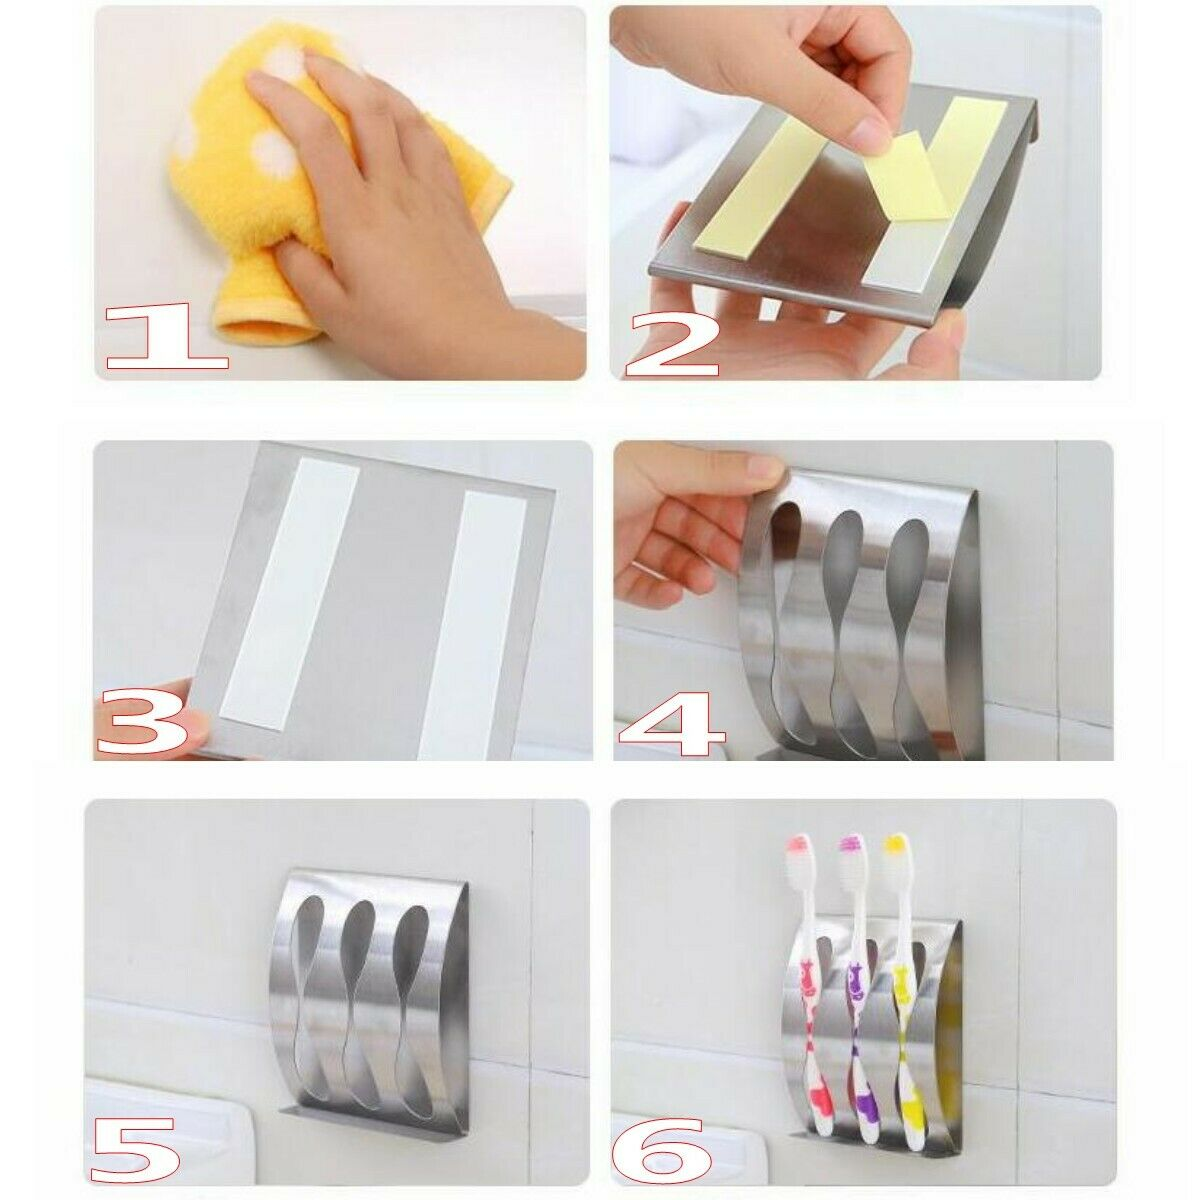 Wall Mount Stainless Steel Toothpaste Dispenser 2//3Position Toothbrush Holder HO